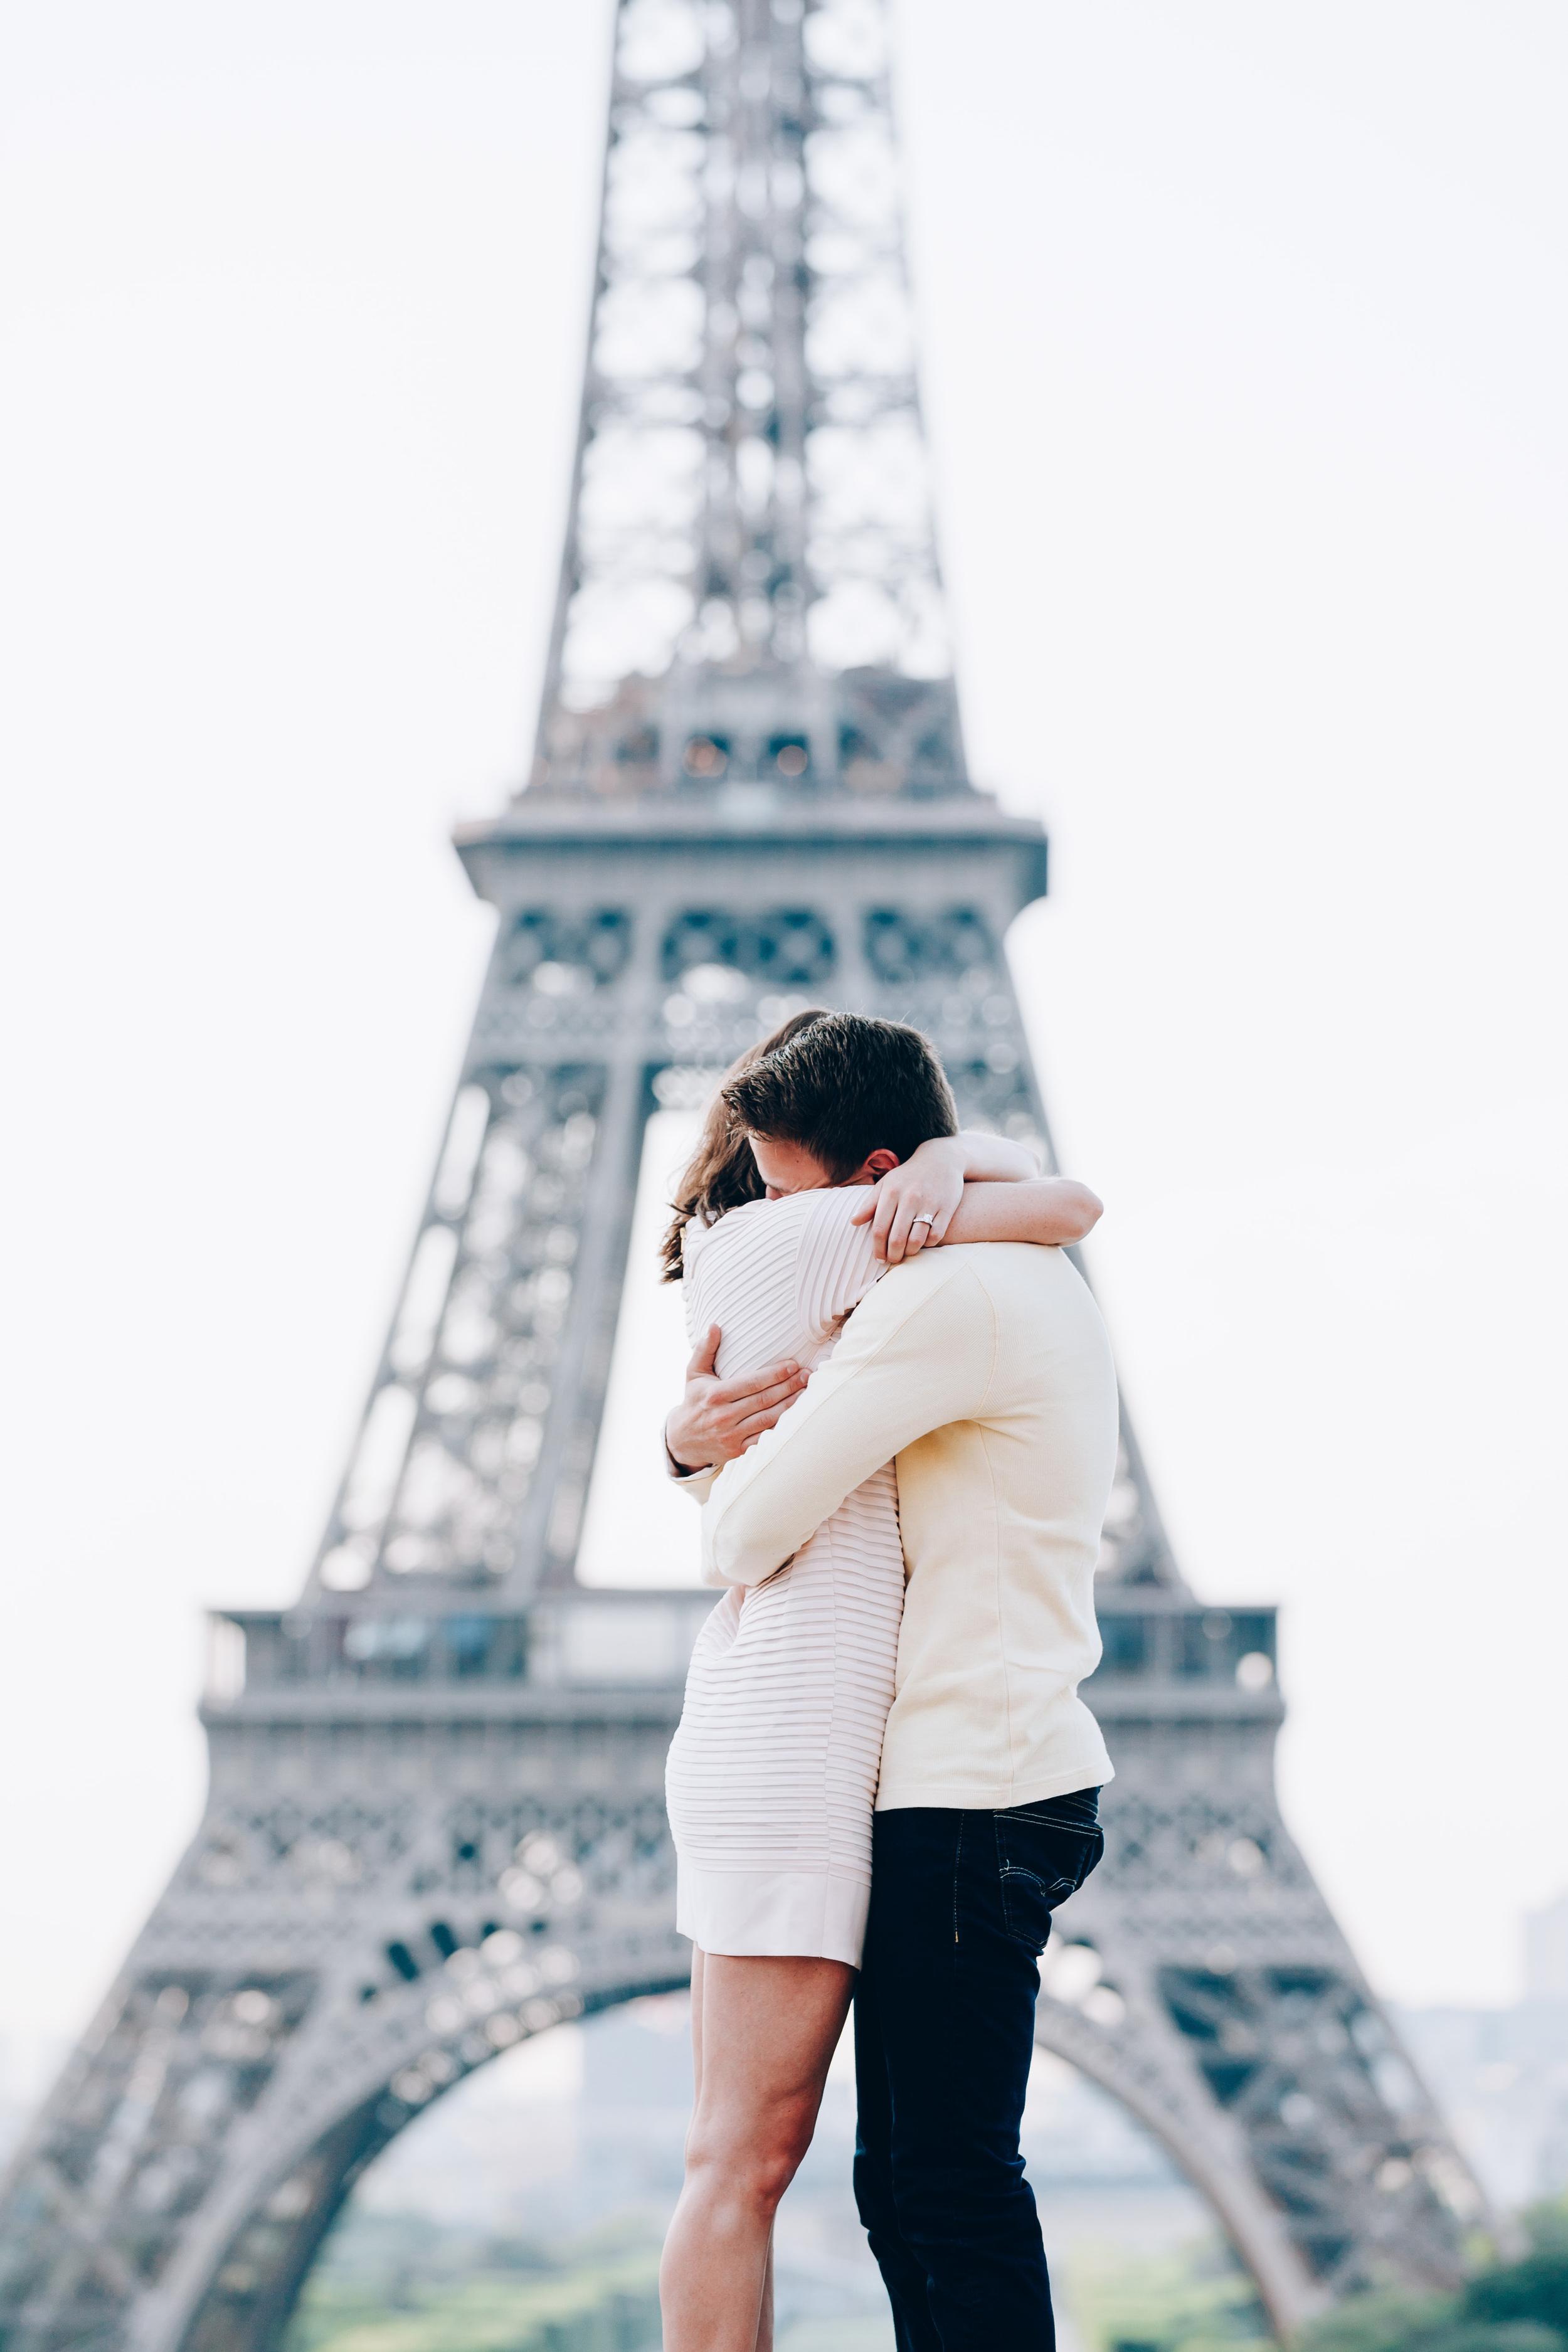 Photographer-in-Paris-Eiffel-Tower-Surprise-Proposal-SheSaidYes-Iheartparisfr.jpg